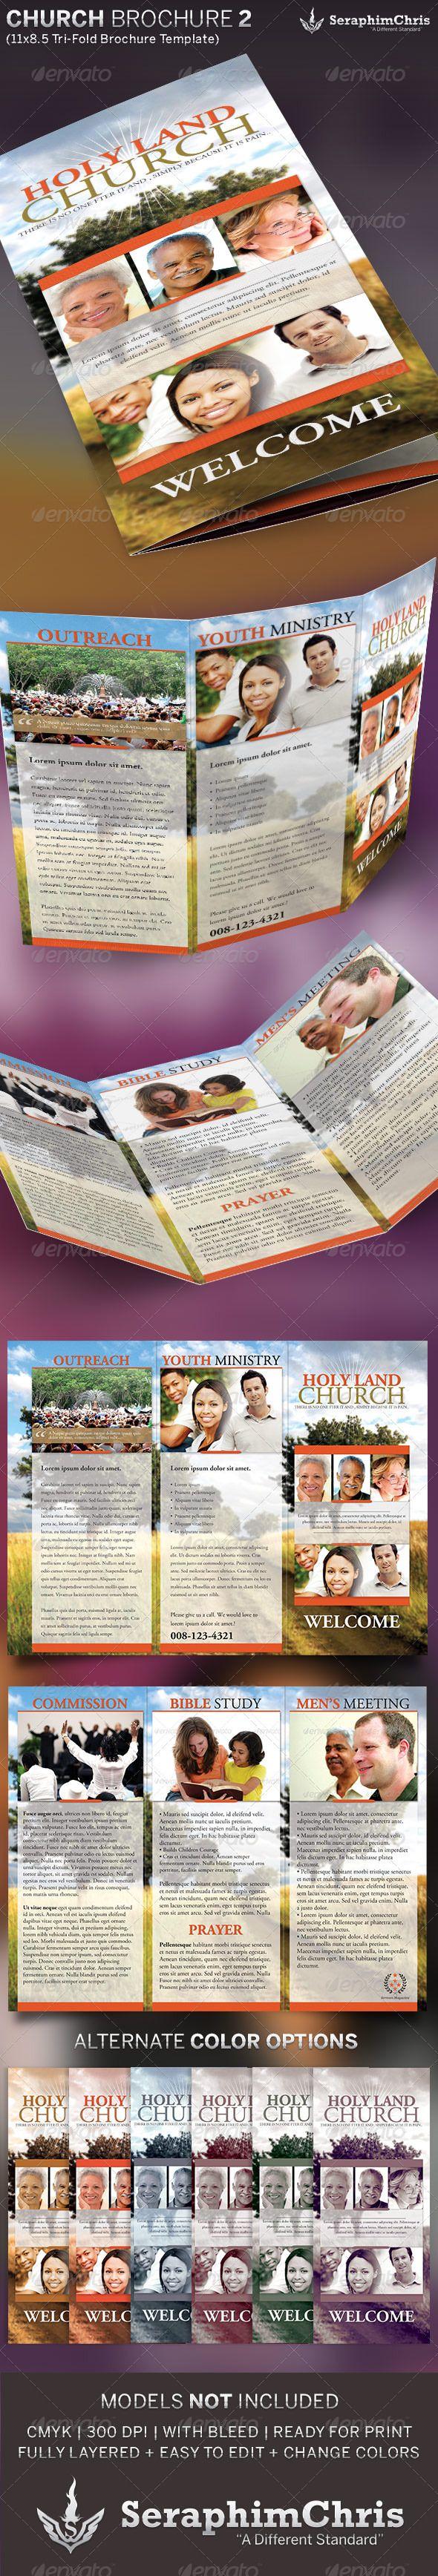 Church Brochure  Religious Design    Brochures